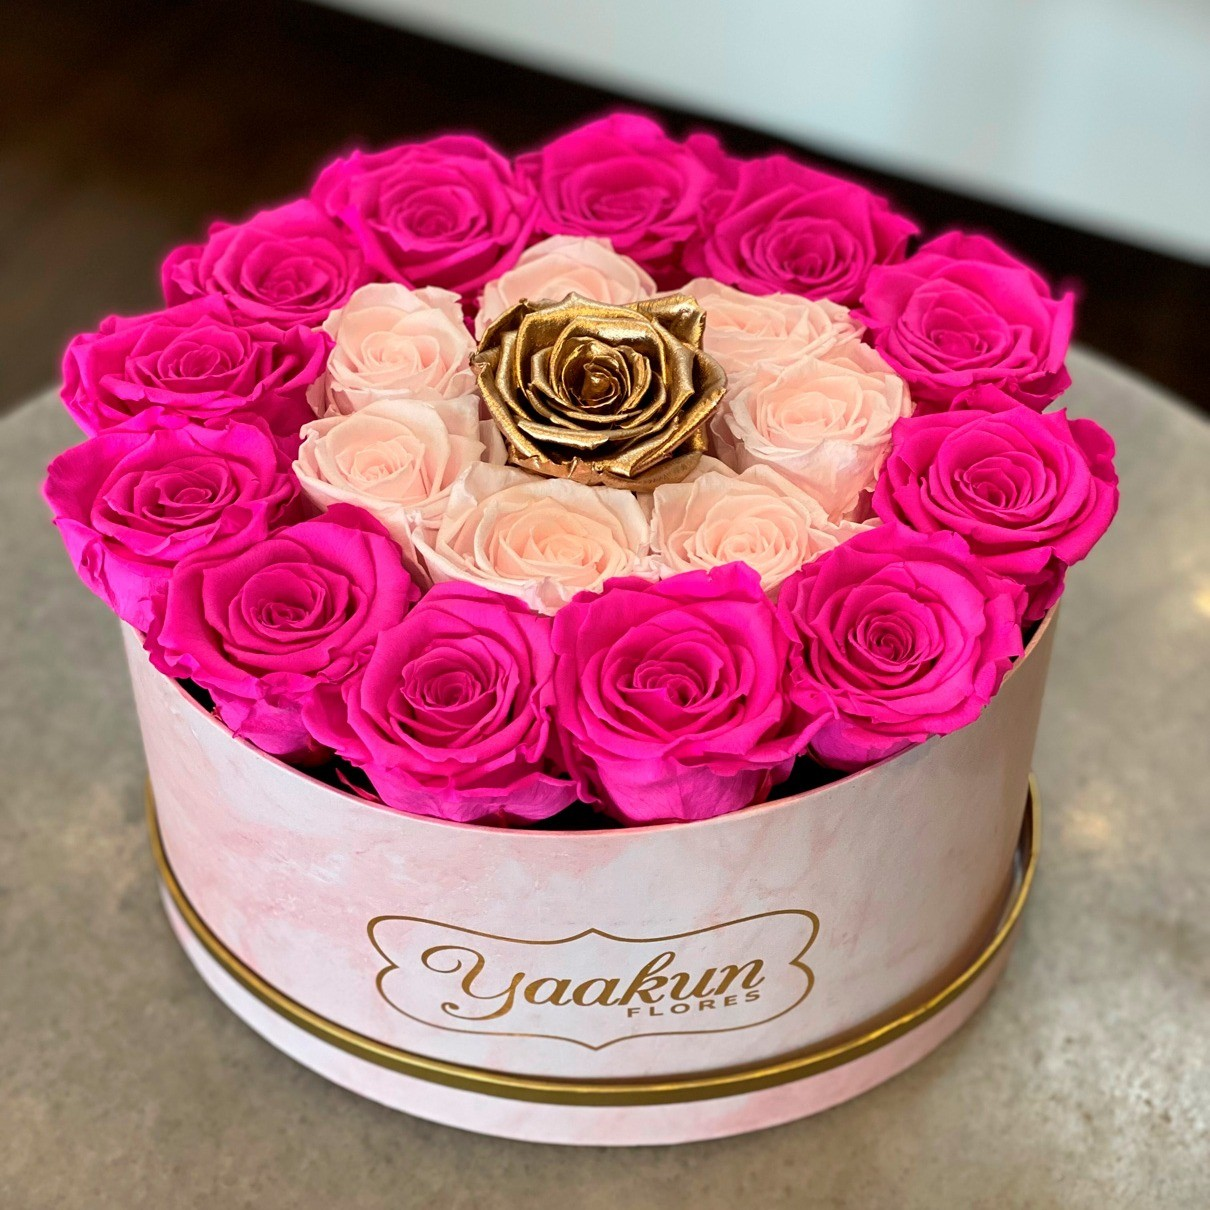 Rosas eternas en caja ovalada pink and gold